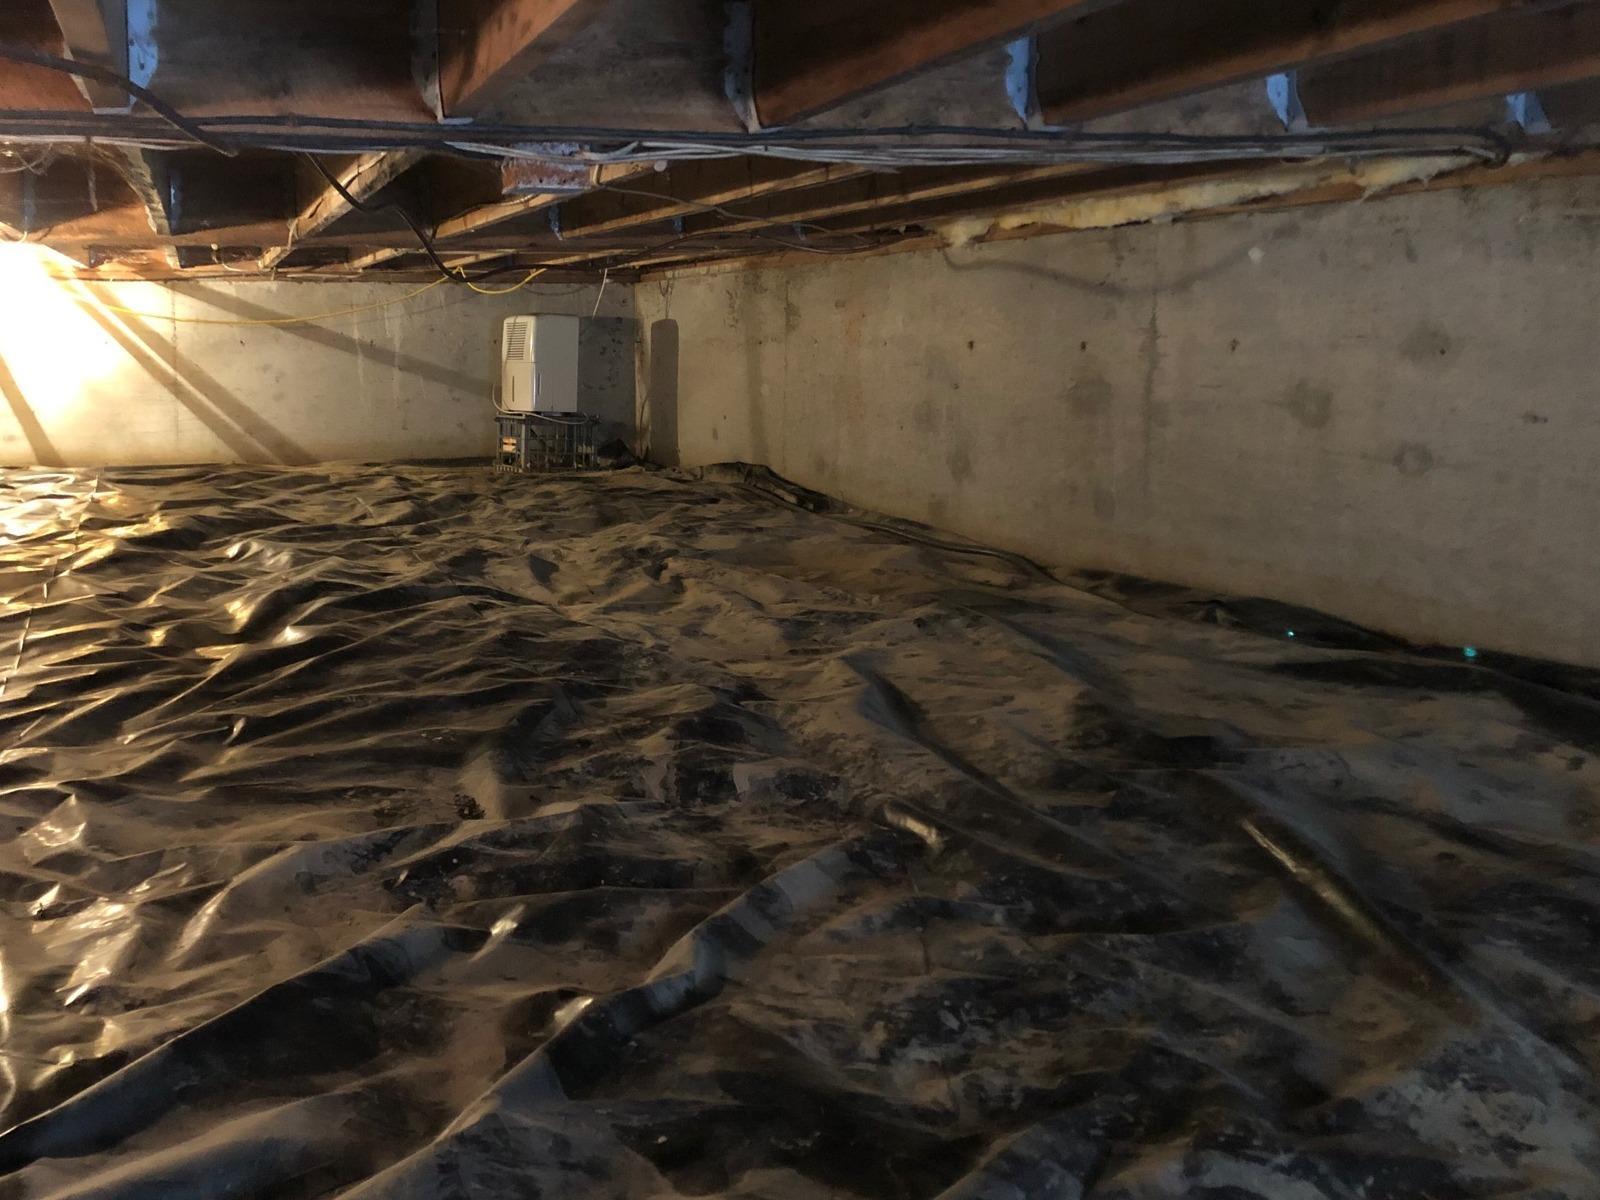 Crawlspace Waterproofing & Winterization in Keene, New Hampshire, by Matt Clark's Northern Basement Systems. - Before Photo